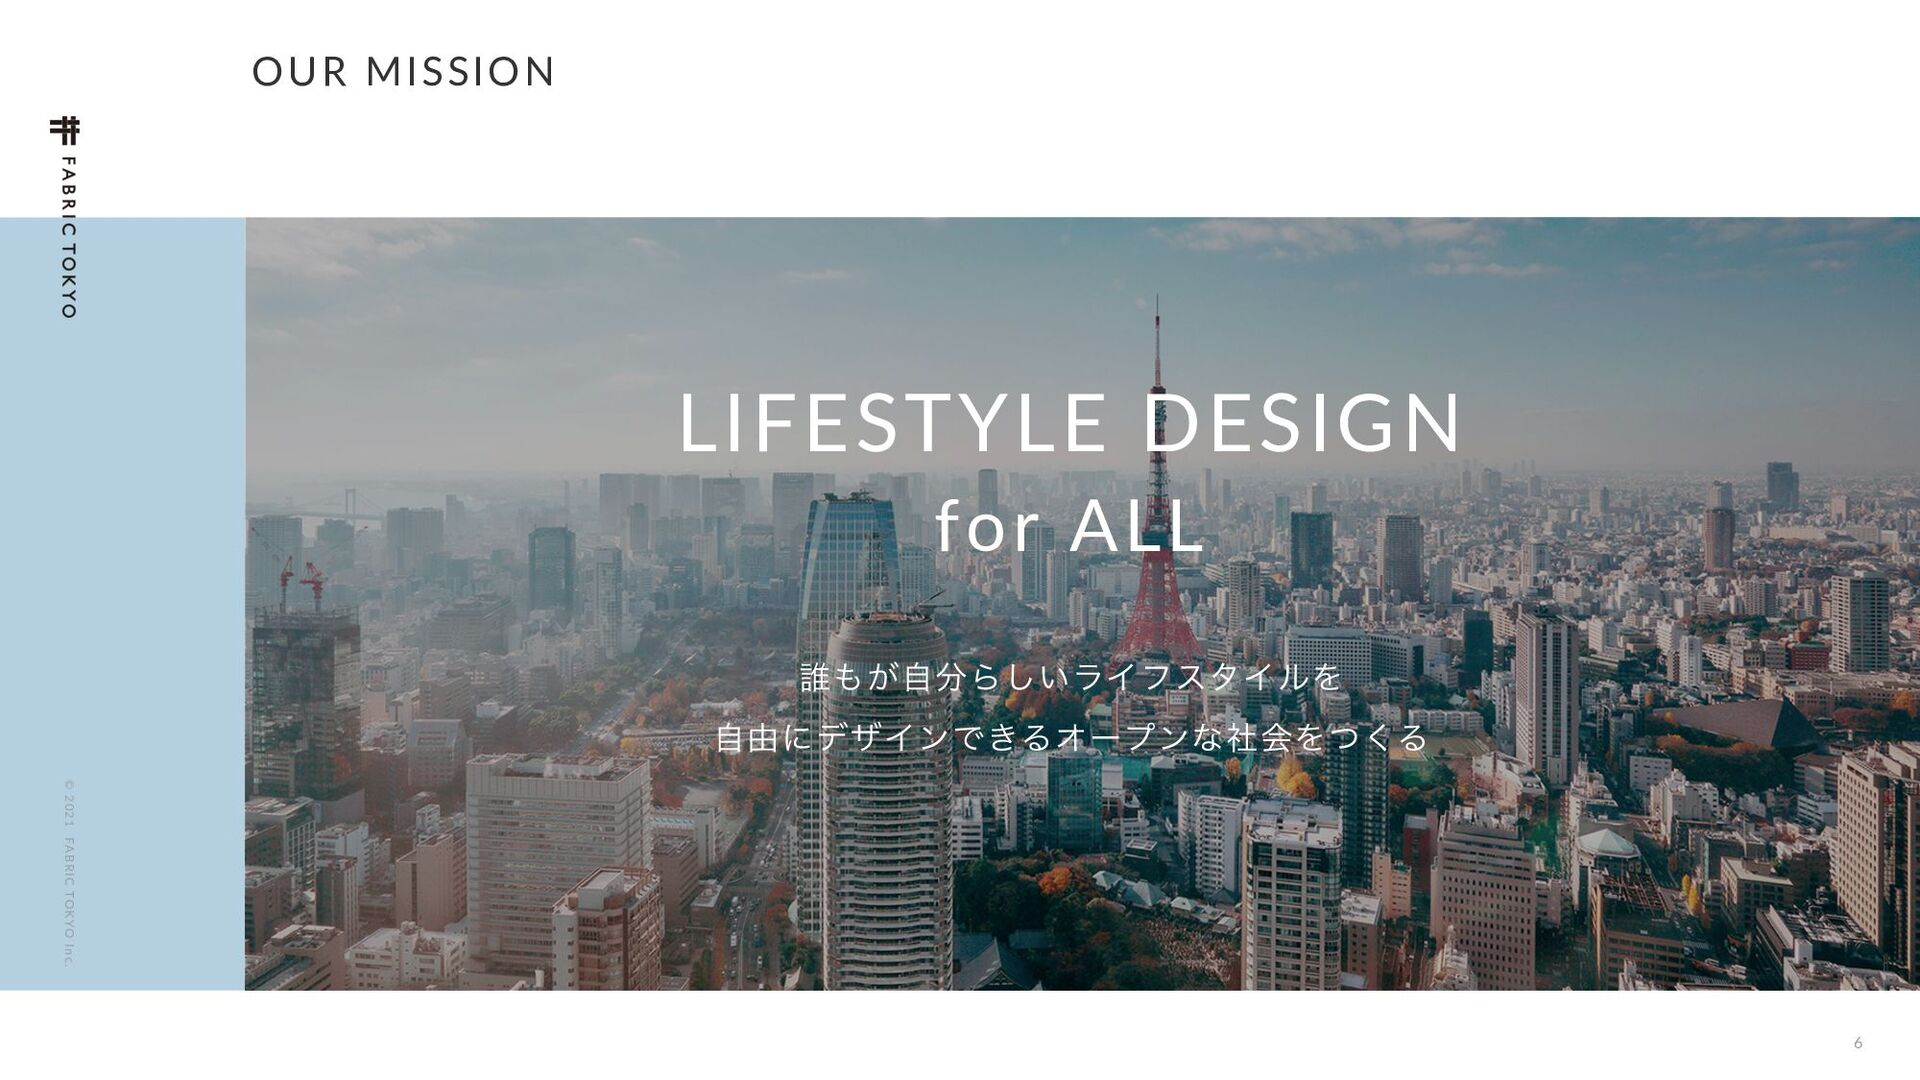 6 © 2021 FABRIC TOKYO Inc. ձࣾԊֵᶃ ݄ʙ...